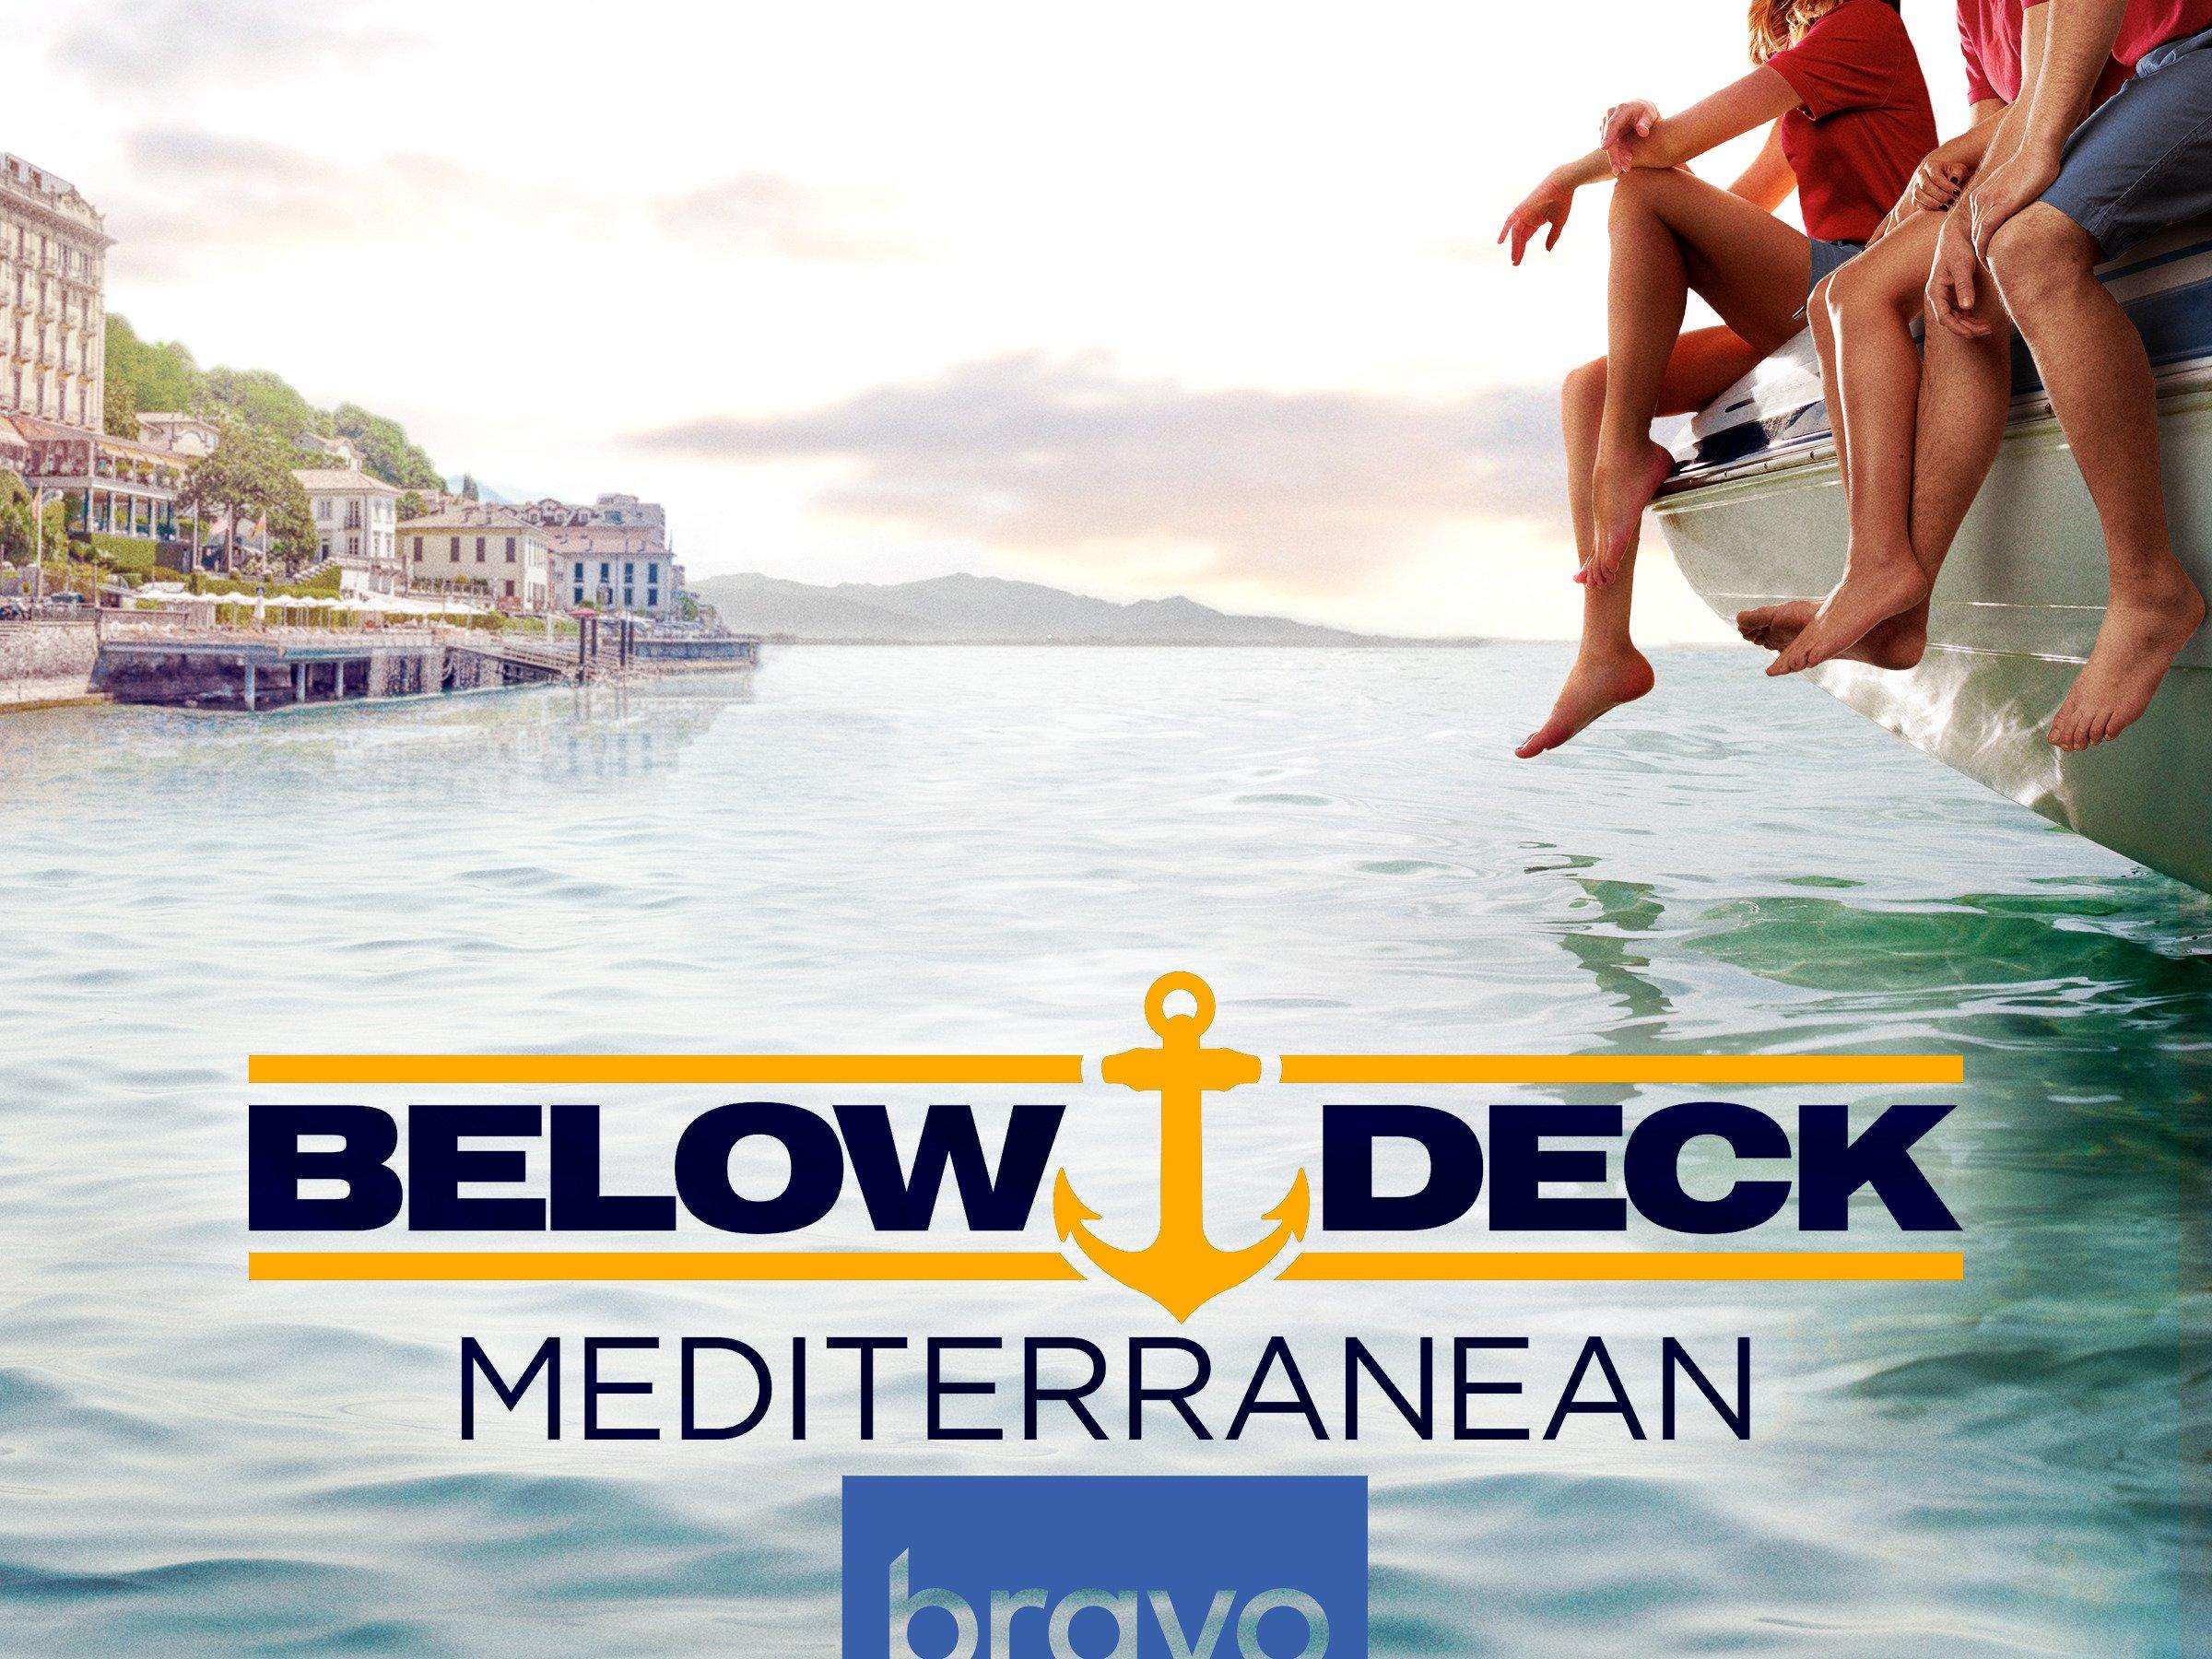 below deck mediterranean season 3 episode 12